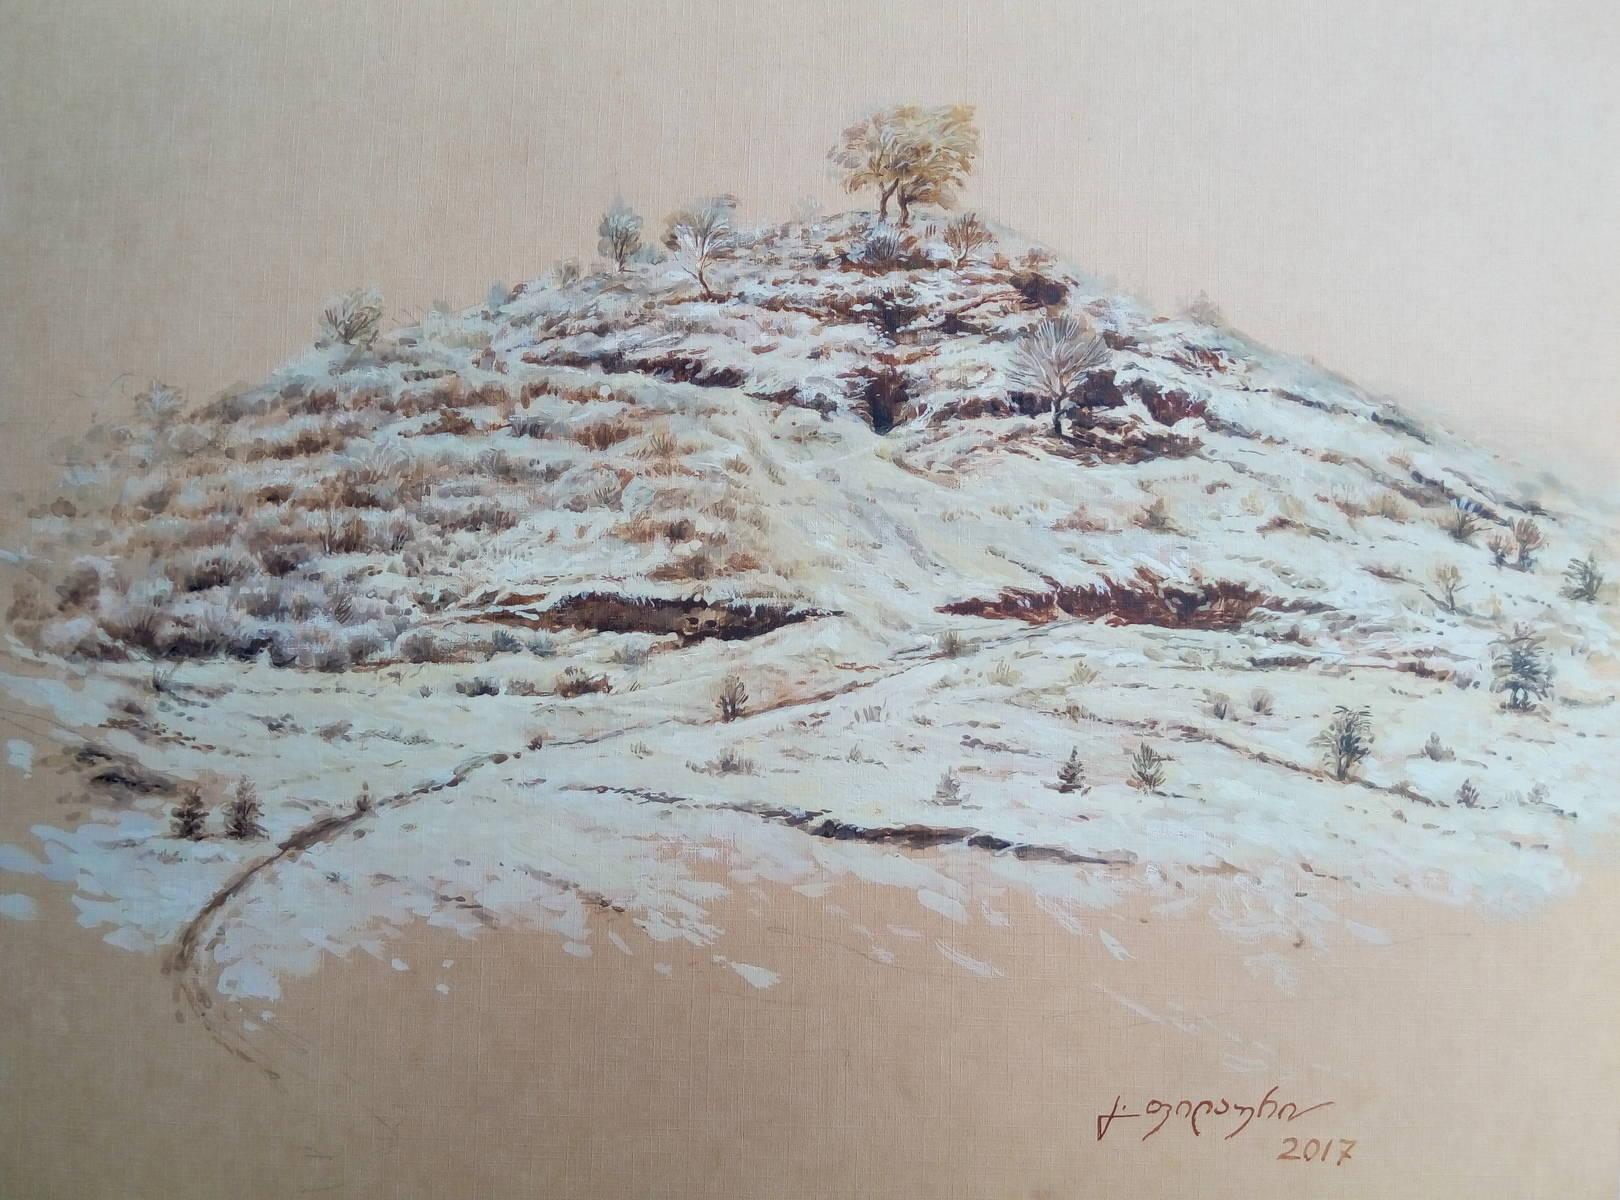 «Сакдриси»           бумага, акварель, гуашь «Sakdrisi»               paper, aquarelle, gouache 30x40, 2017